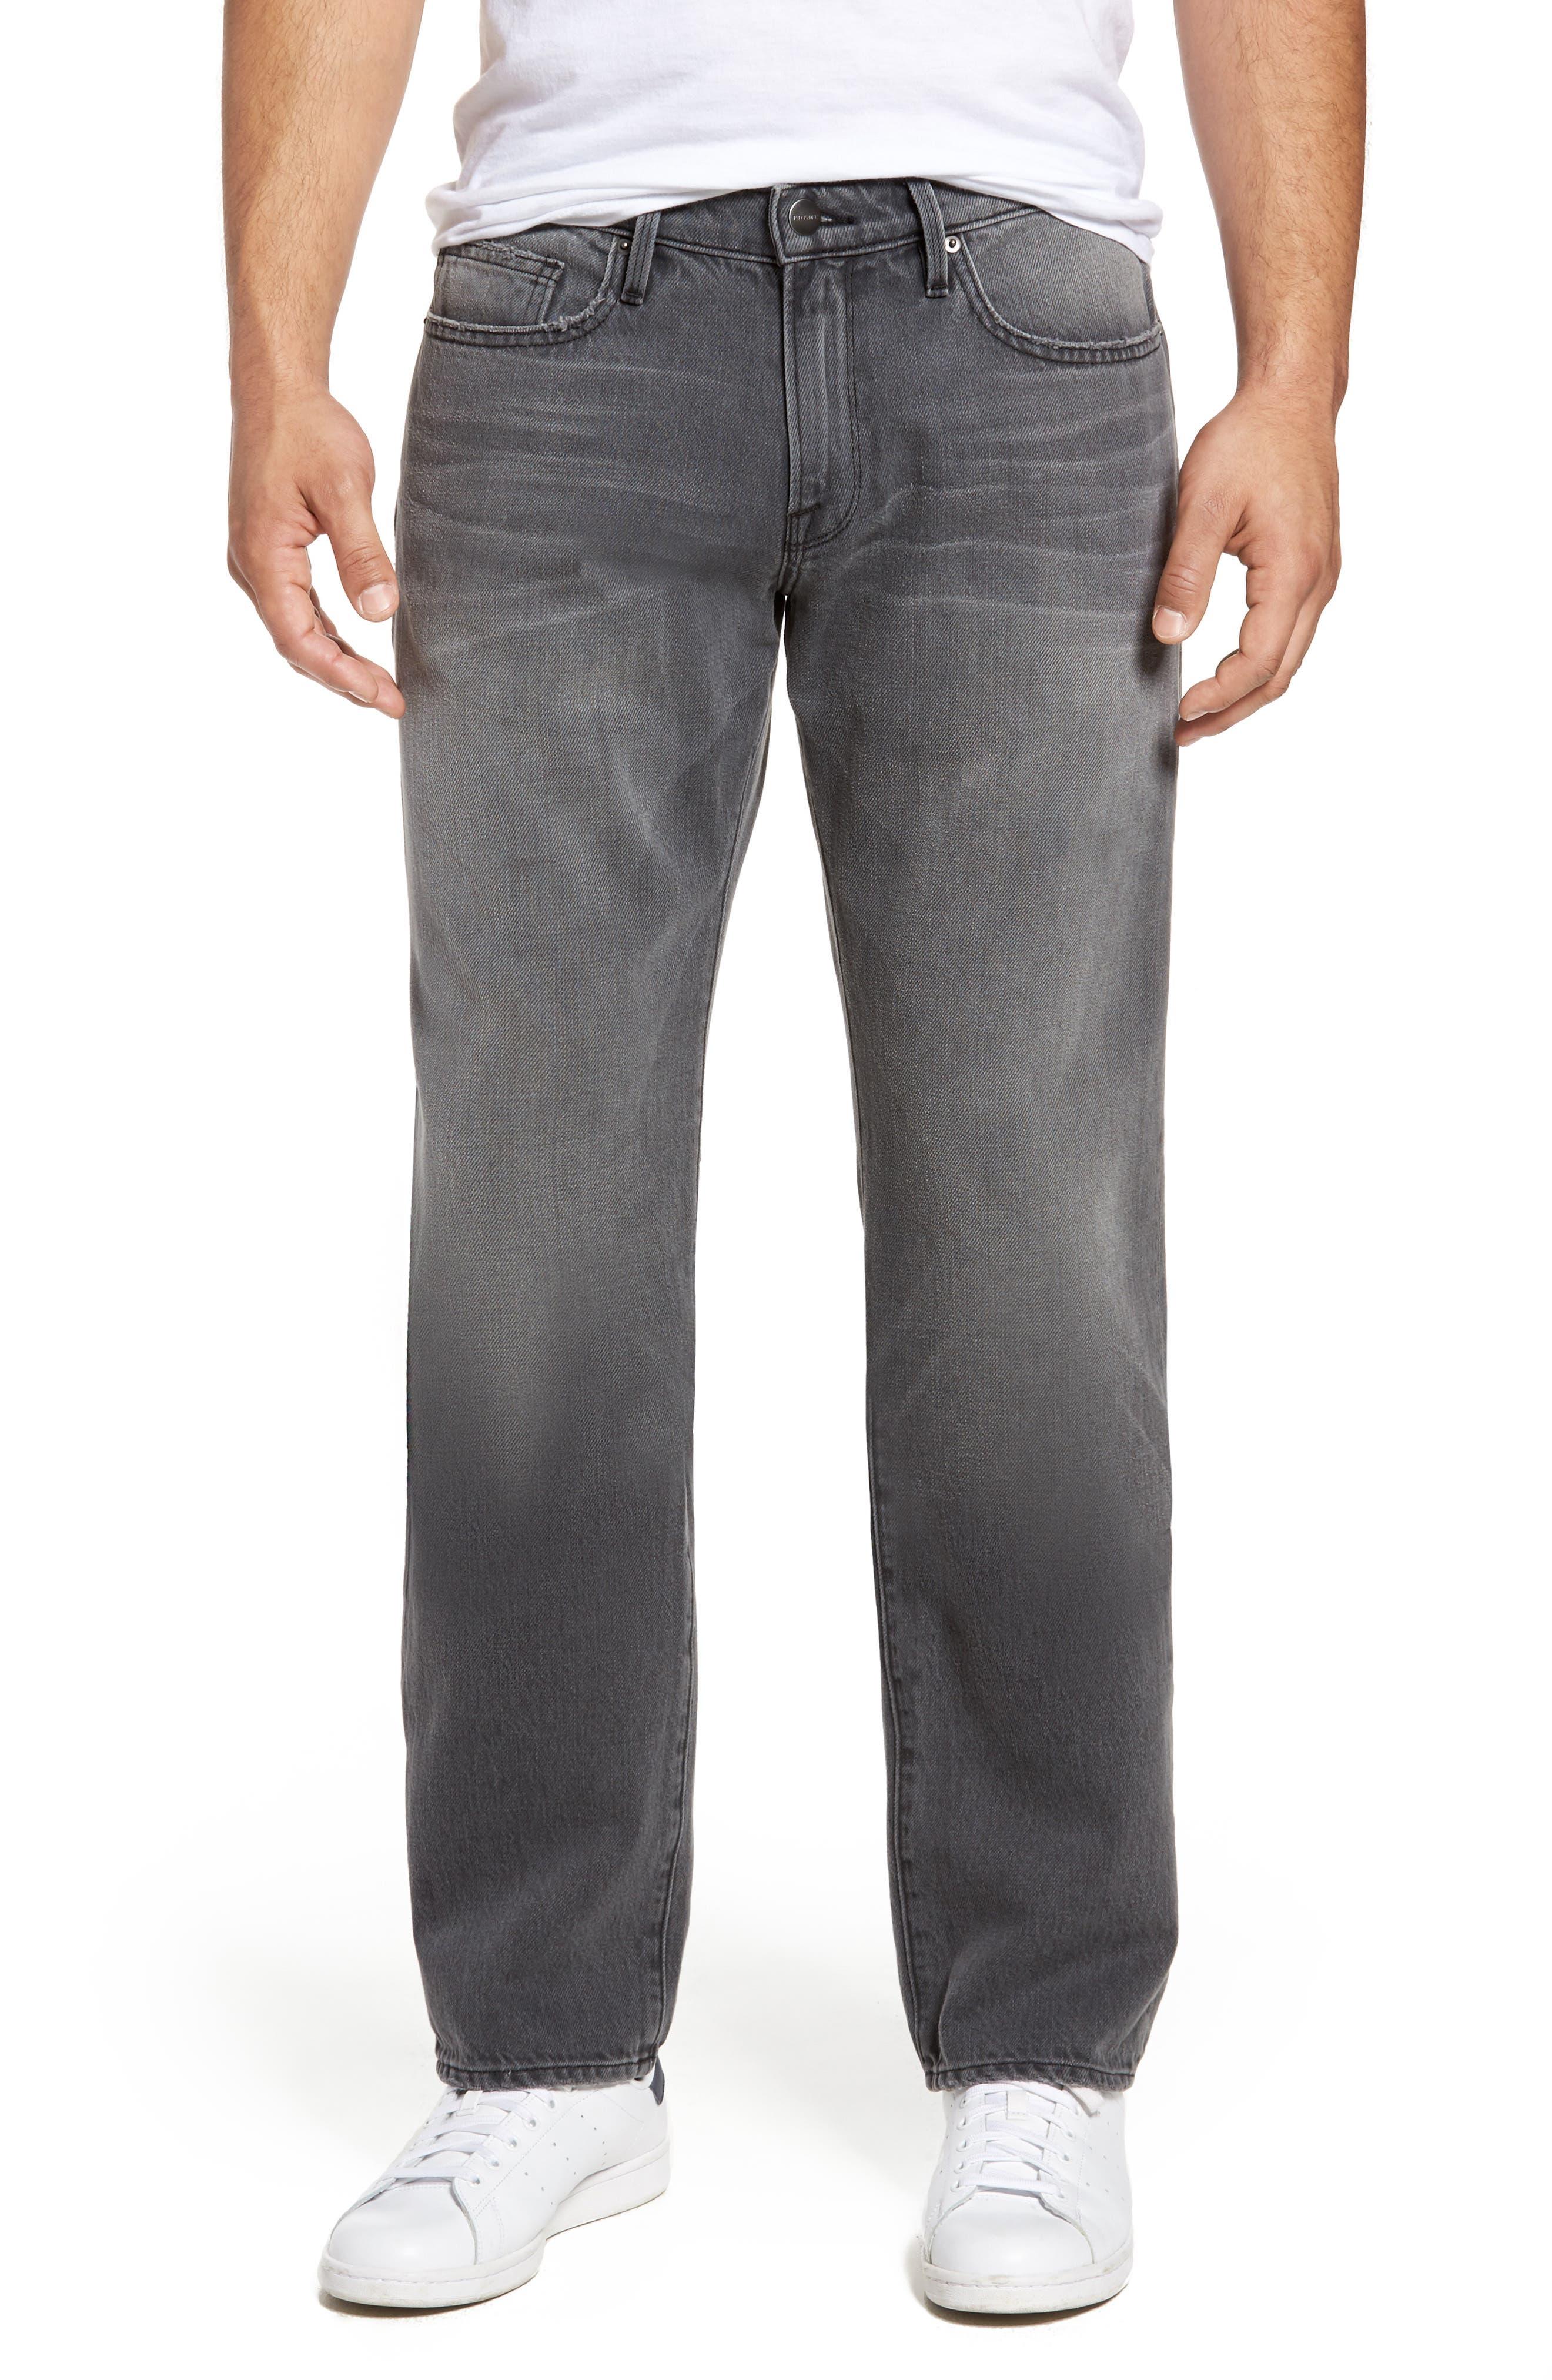 L'Homme Slim Straight Leg Jeans,                             Main thumbnail 1, color,                             050